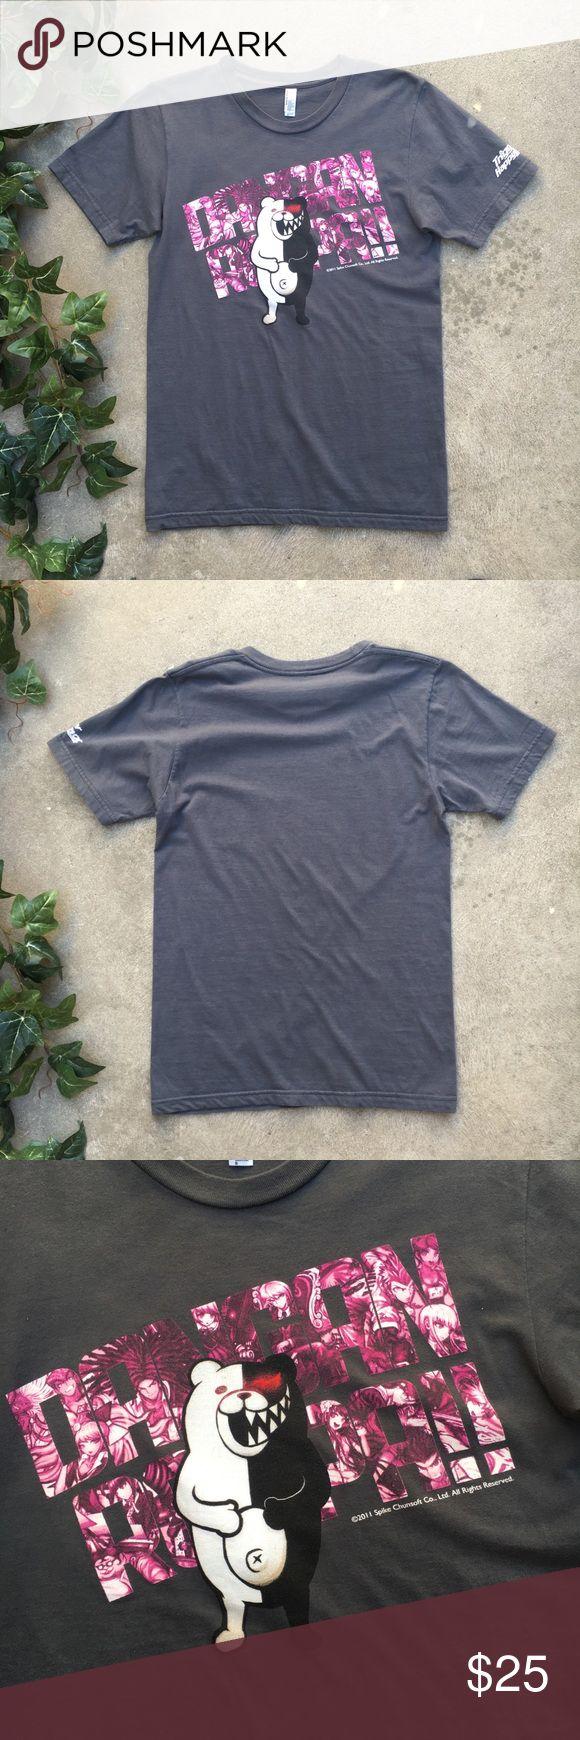 American Apparel Trigger Happy Havoc Dark gray tee shirt with Danganronpa: Trigger Happy Havoc logo on front American Apparel Tops Tees - Short Sleeve